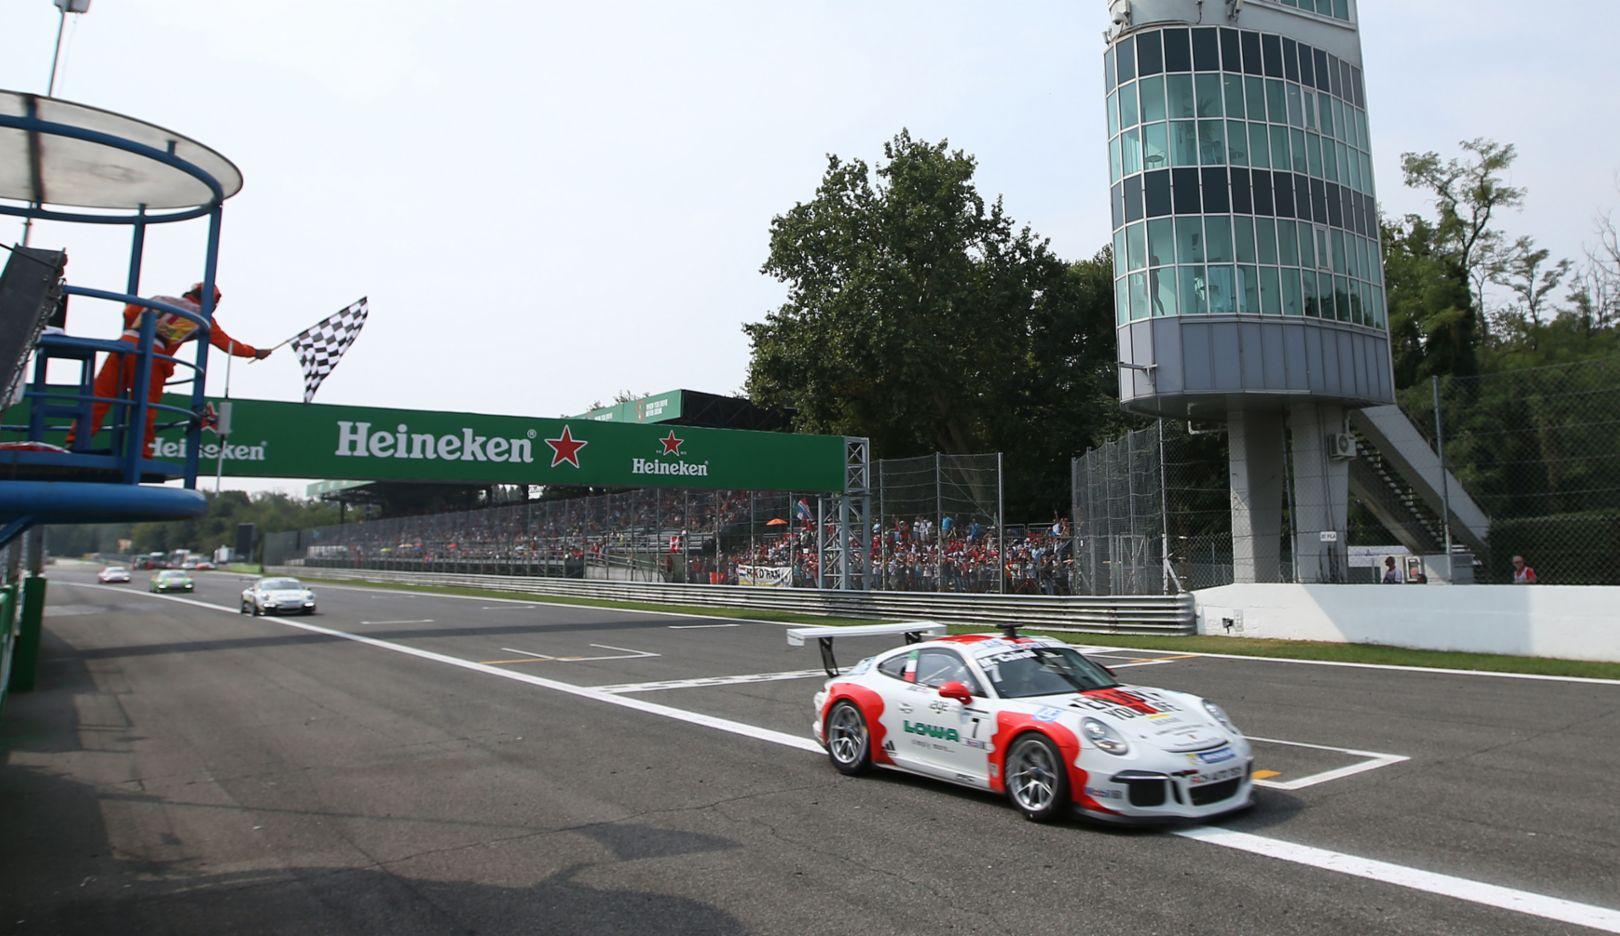 911 GT3 Cup, Porsche Mobil 1 Supercup, Monza, 2016, Porsche AG